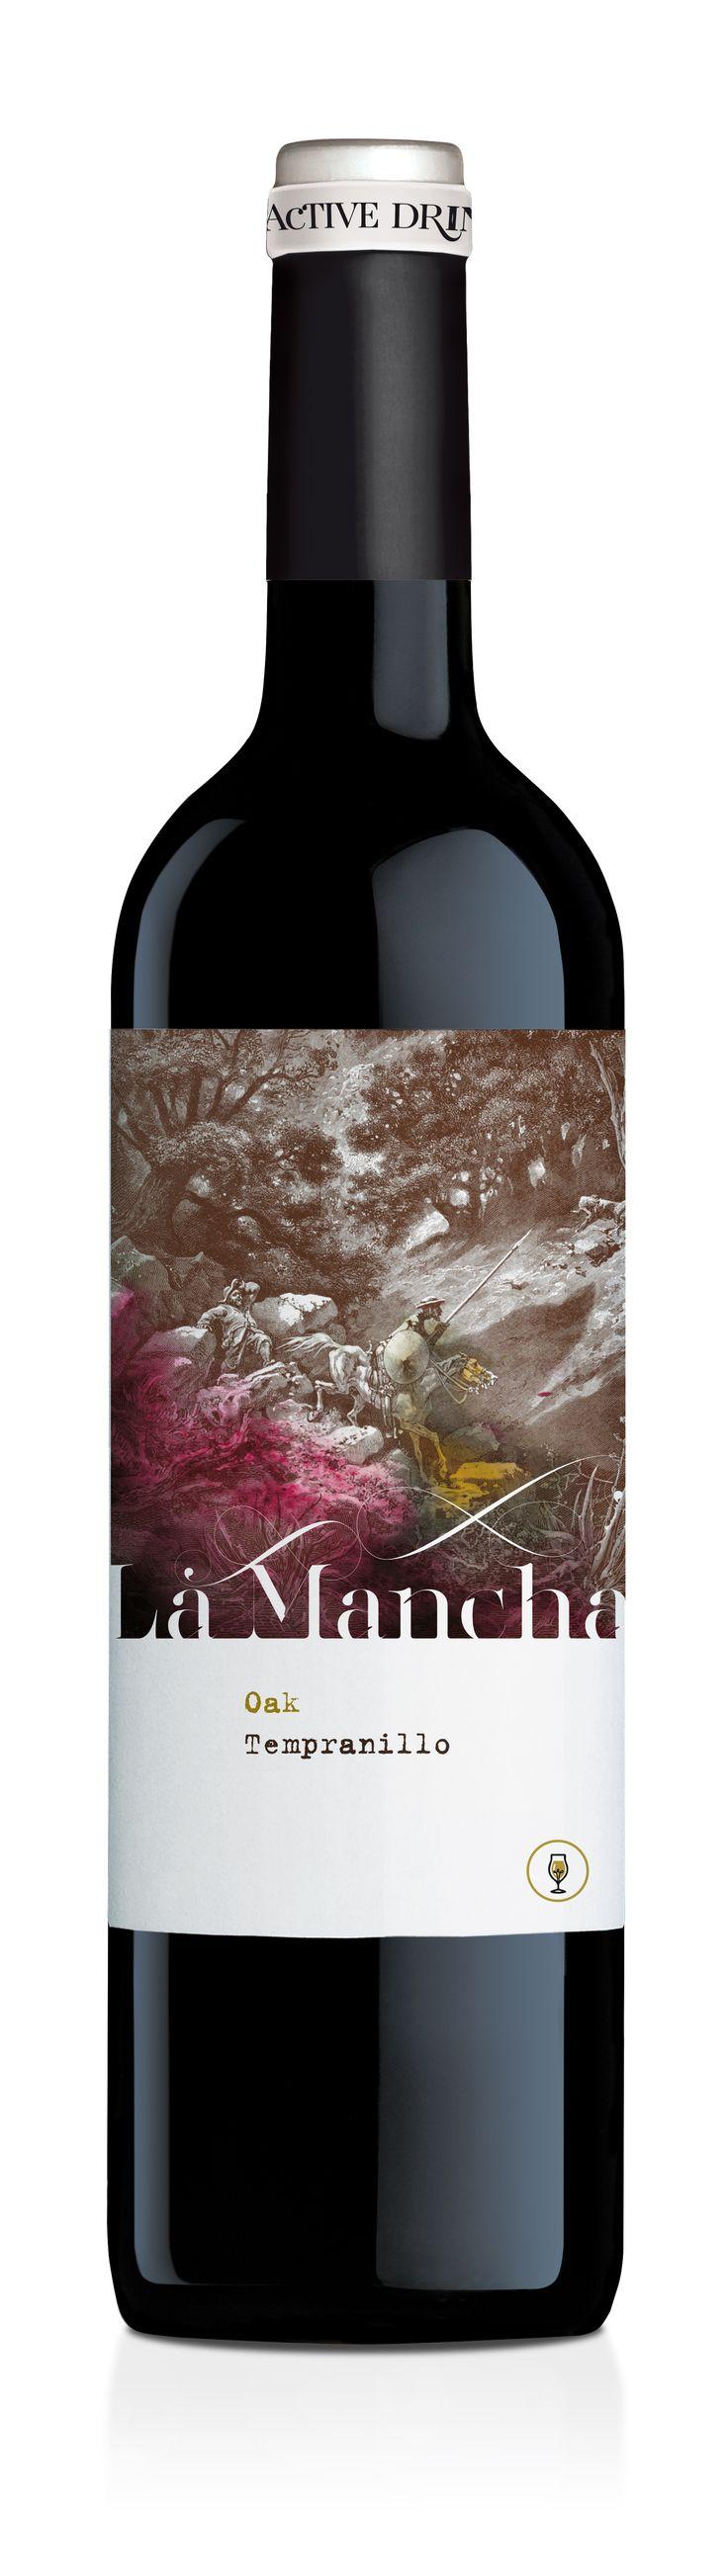 Tempranillo Roble • La Mancha D.O.